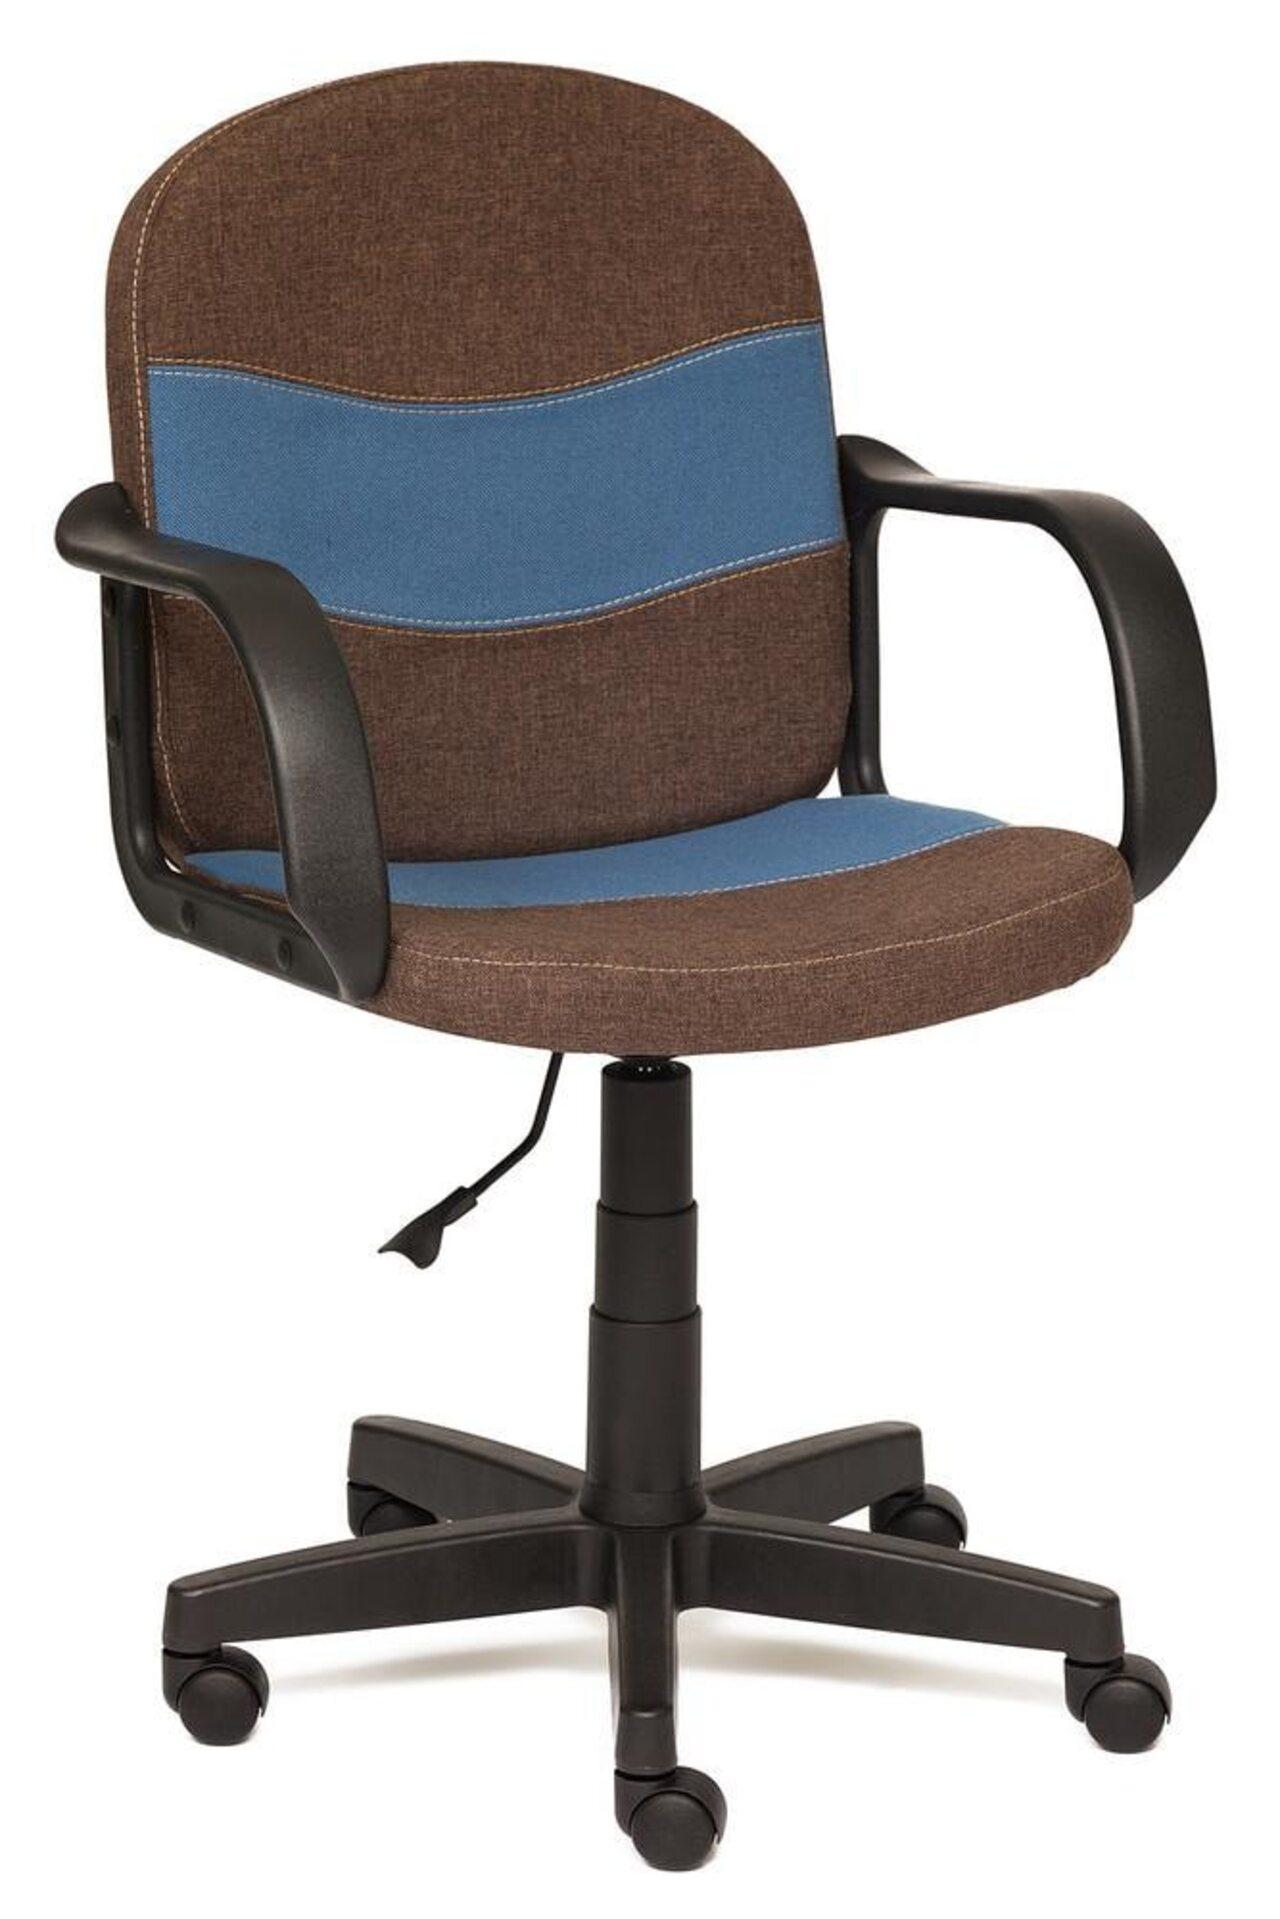 Кресло для персонала BAGGI (ткань) - фото 1